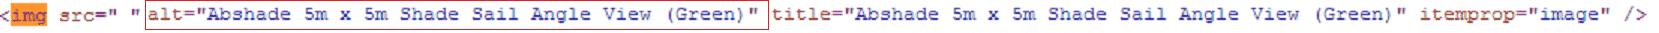 Alt tags with desirable keywords